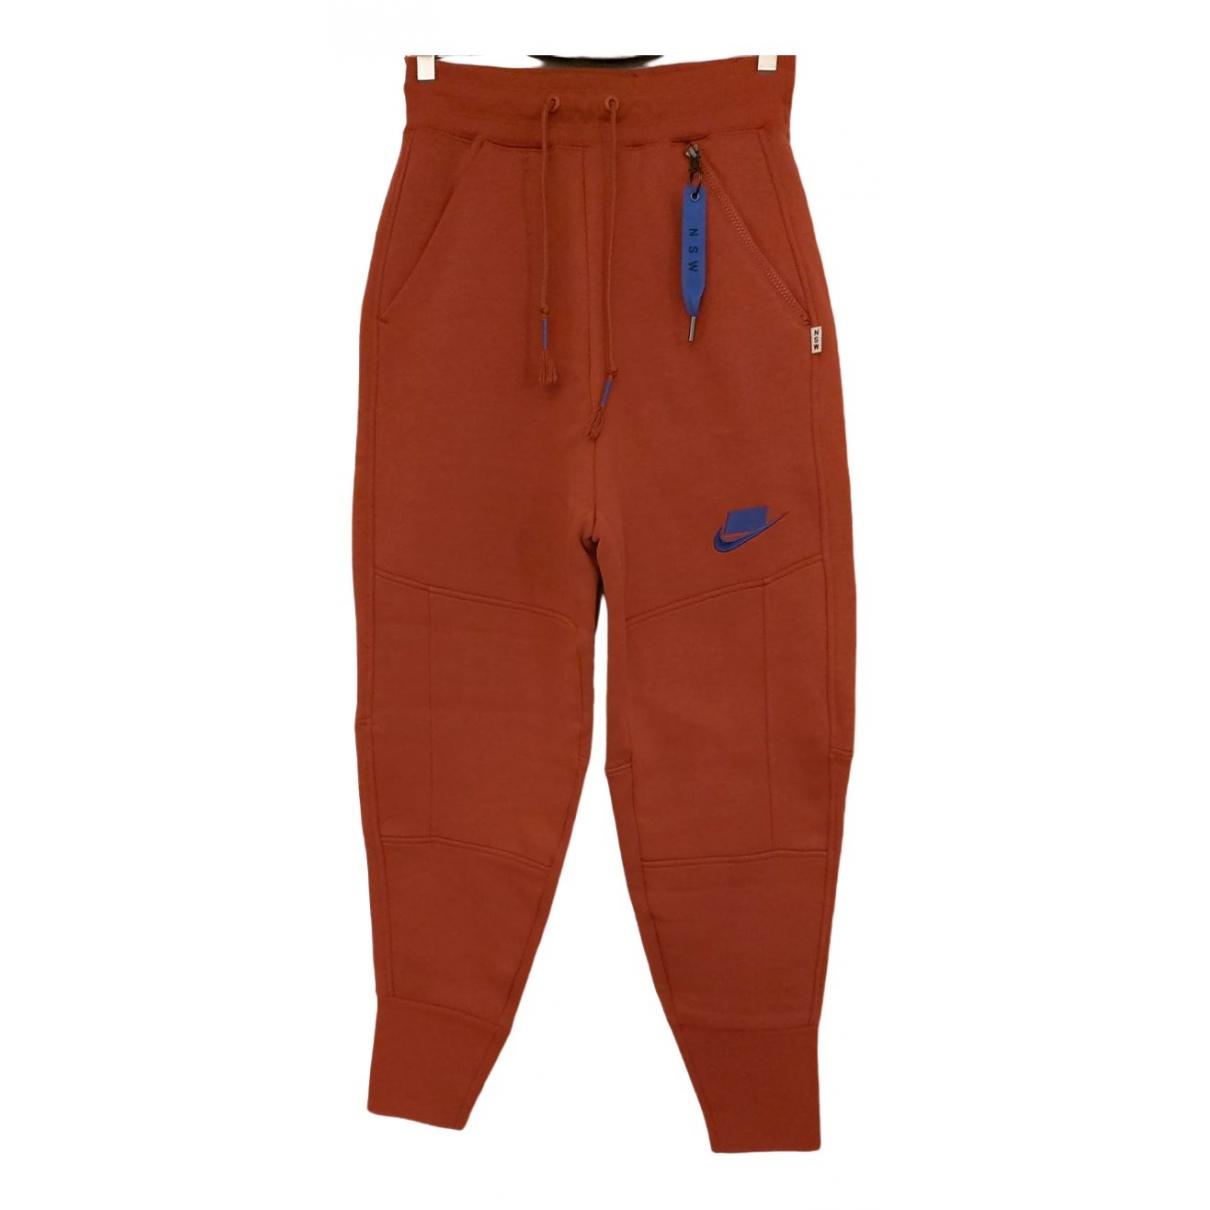 Nike - Pantalon   pour femme en elasthane - orange